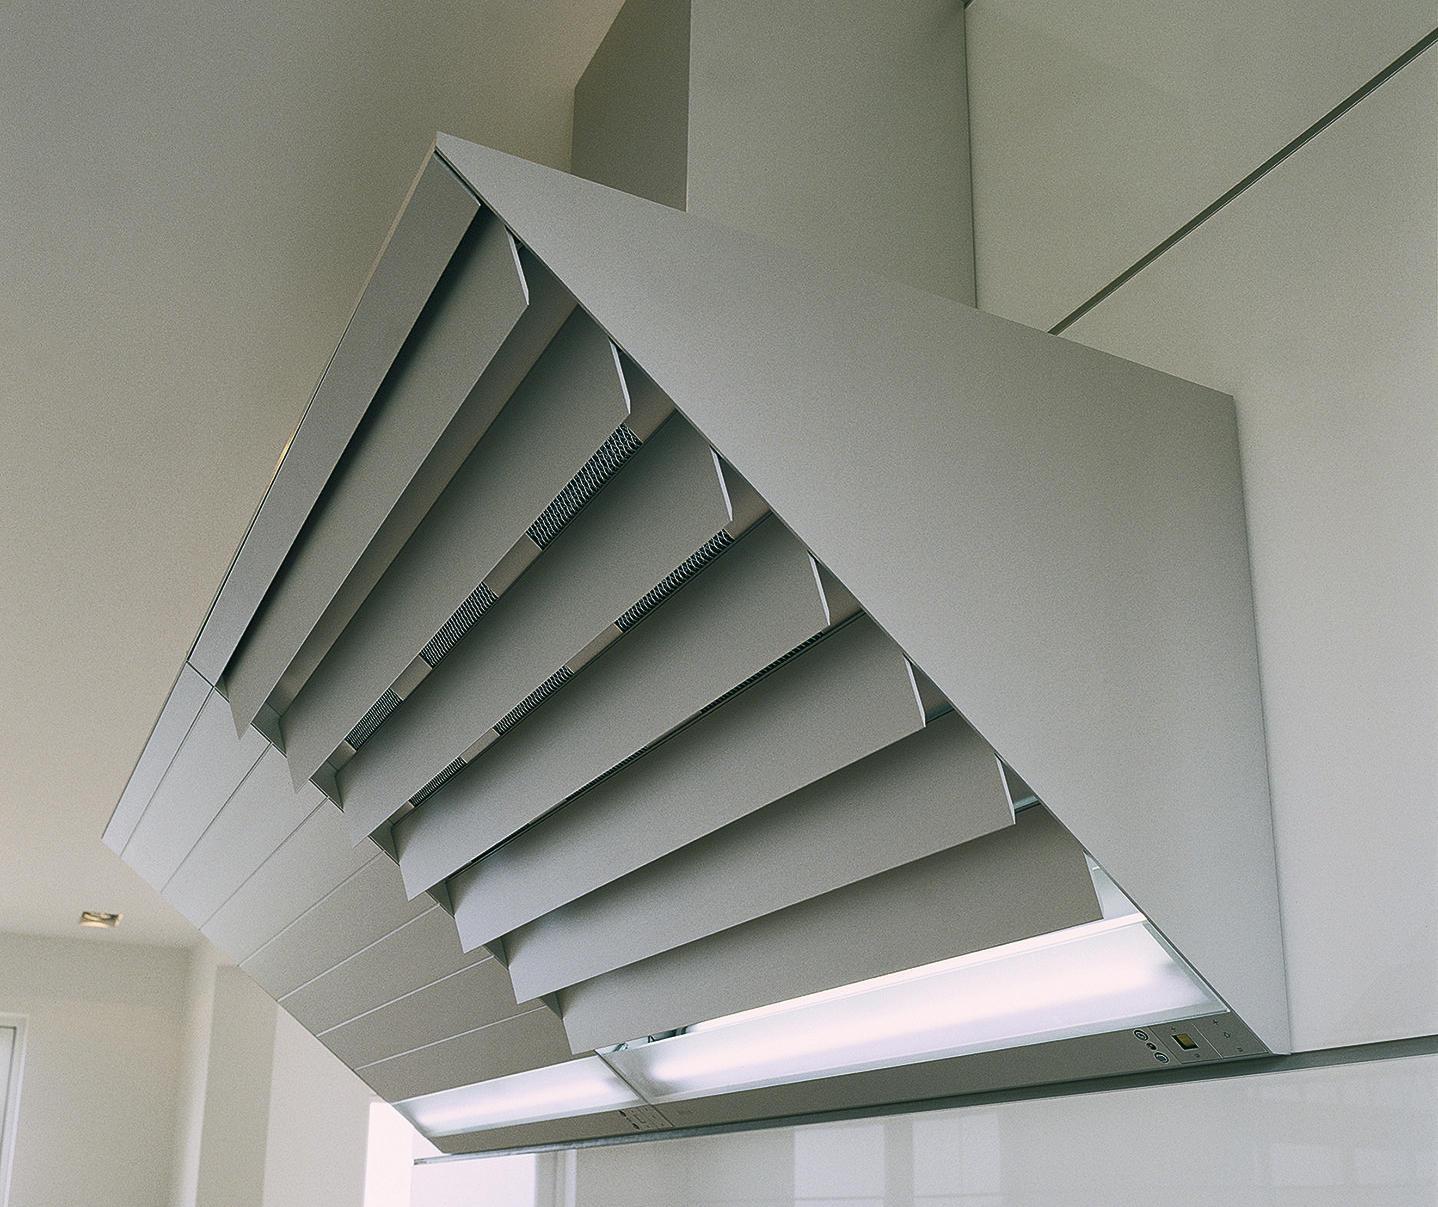 lamellenhaube k chenabzugshauben von bulthaup architonic. Black Bedroom Furniture Sets. Home Design Ideas